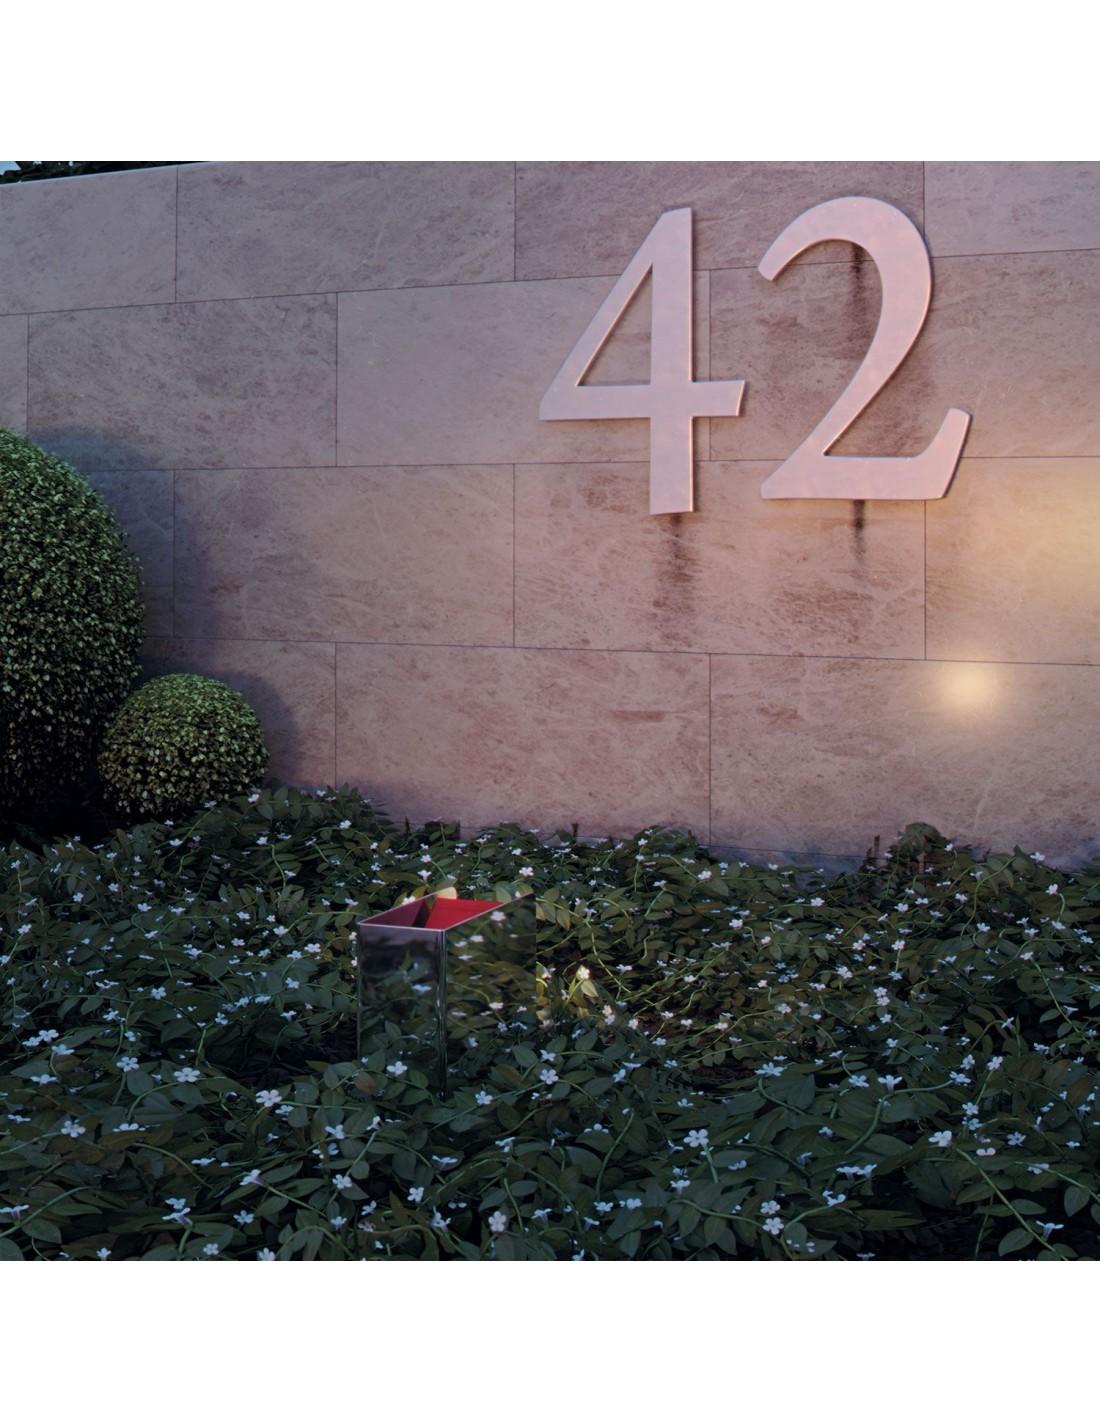 borne de jardin mise en scène de la marque Royal Botania.